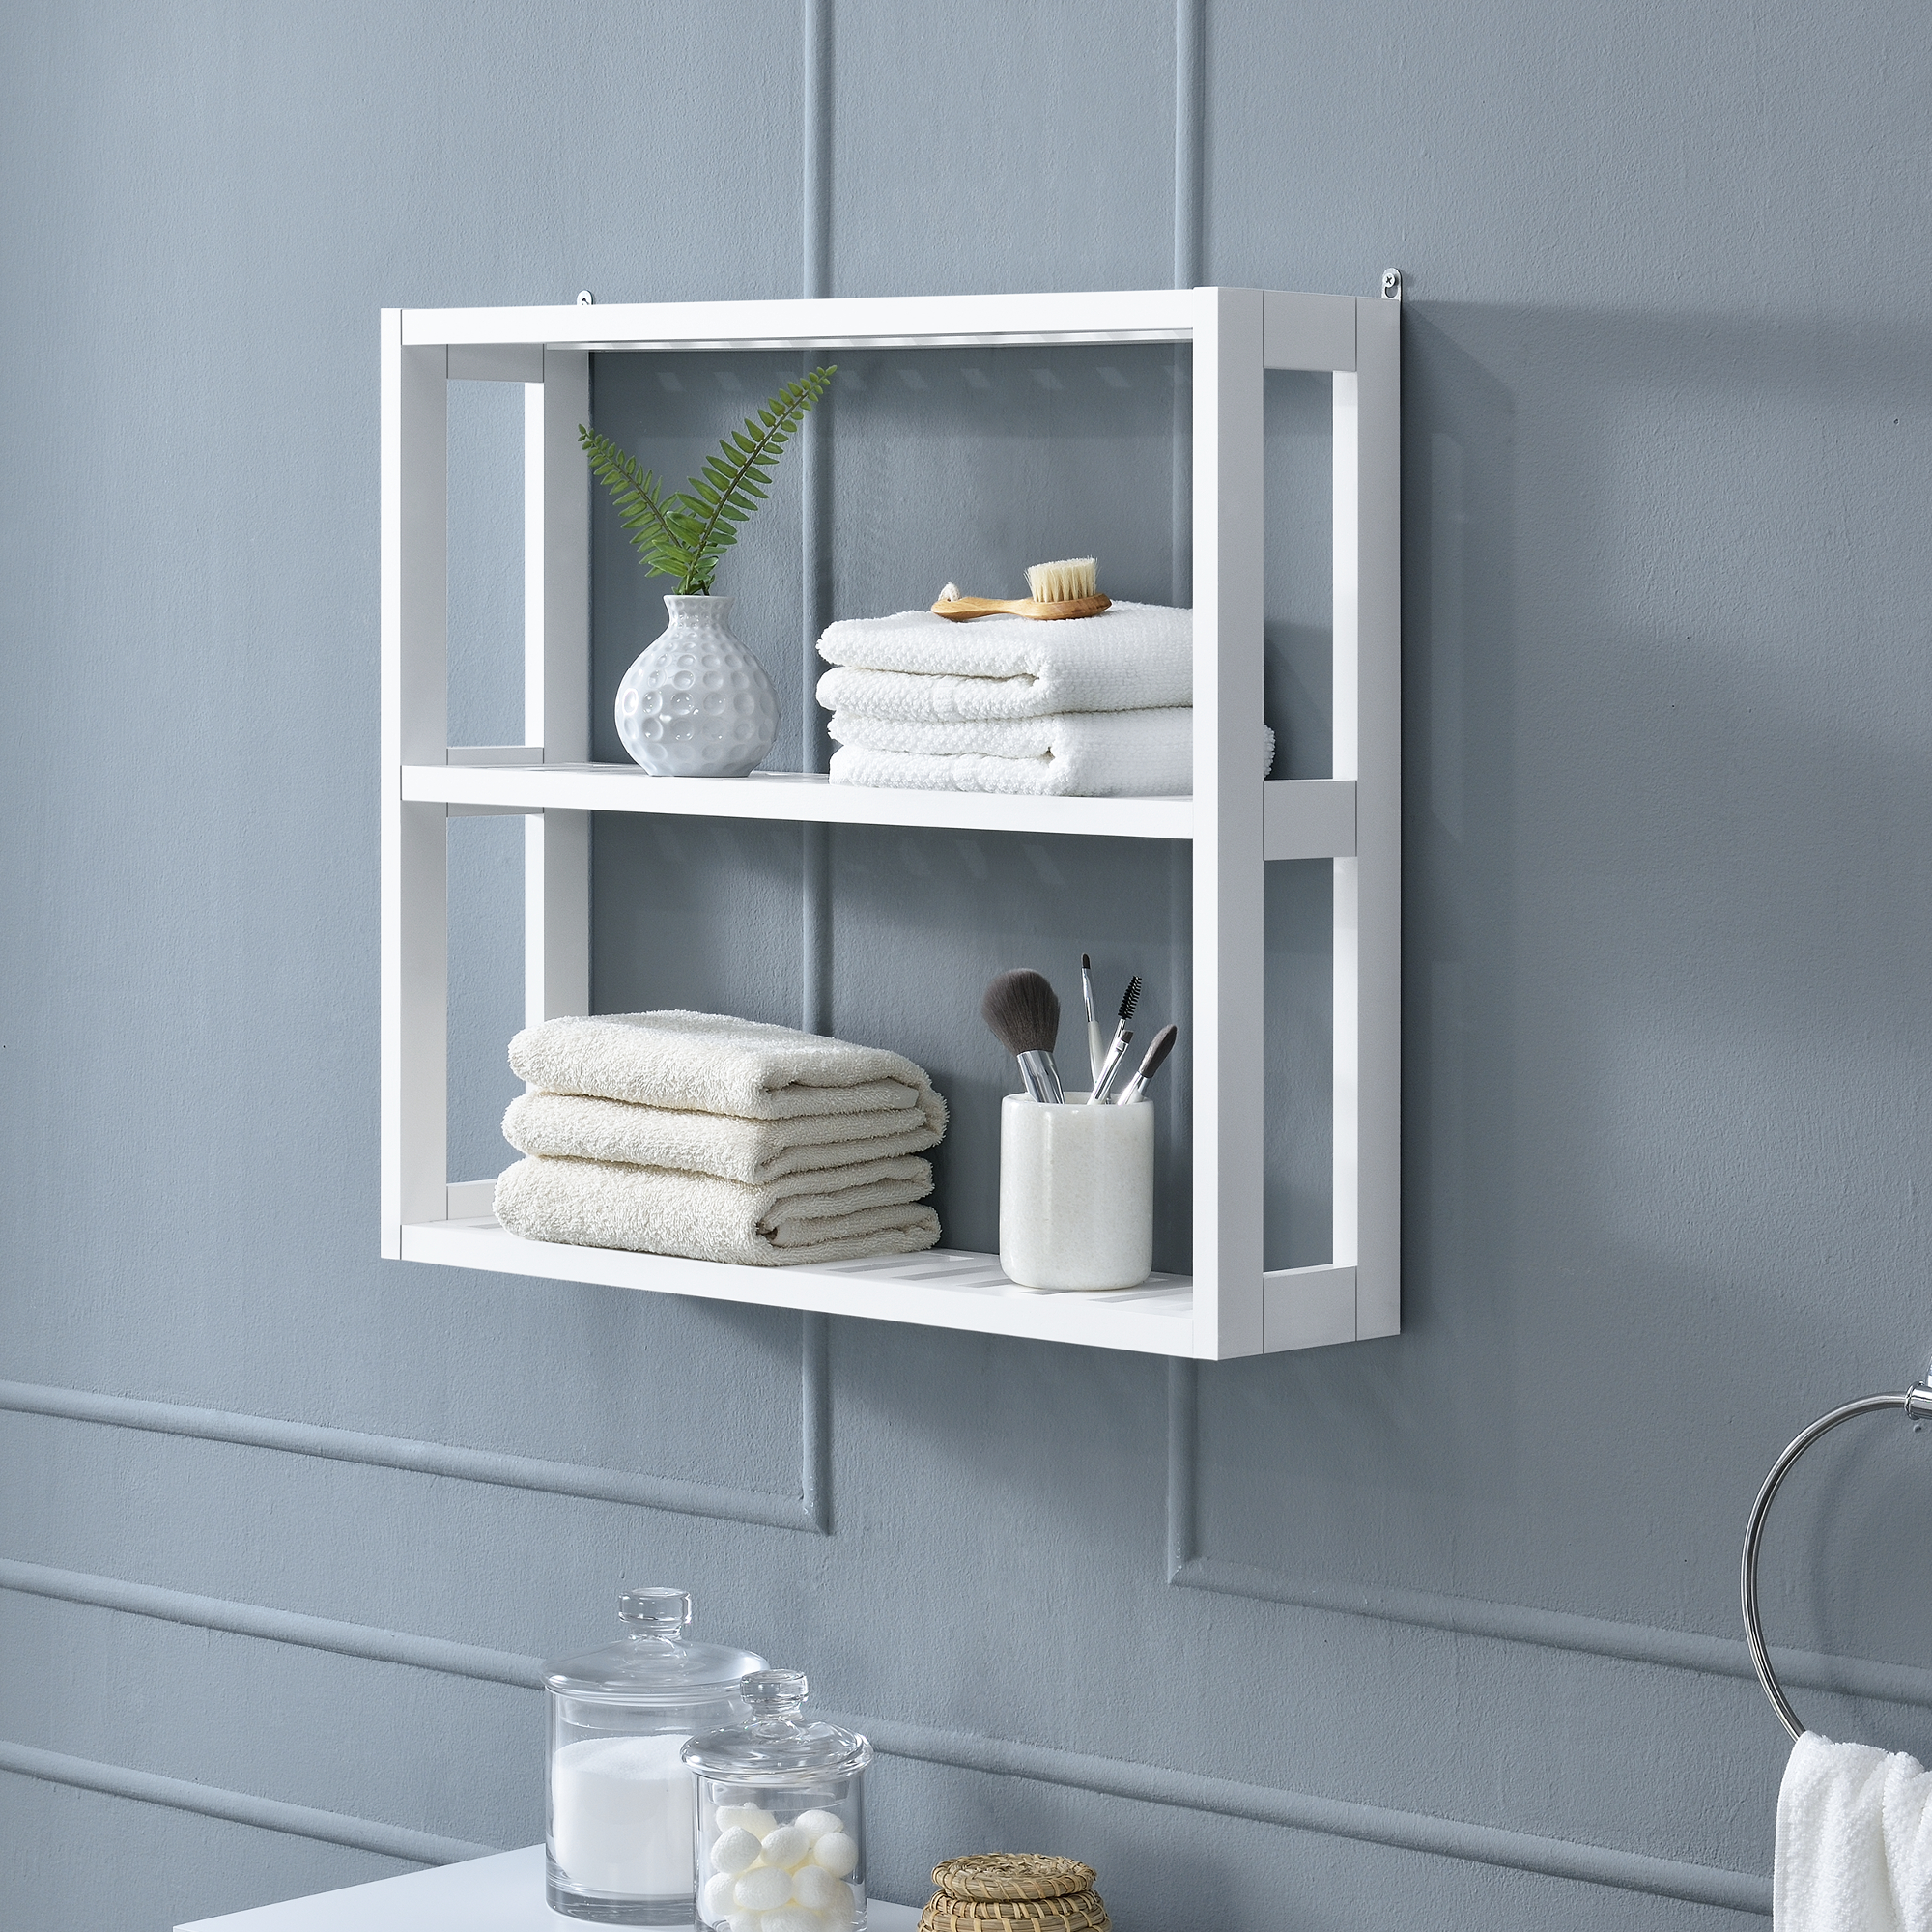 badezimmerm bel badschrank wandschrank unterschrank spiegel regal ebay. Black Bedroom Furniture Sets. Home Design Ideas